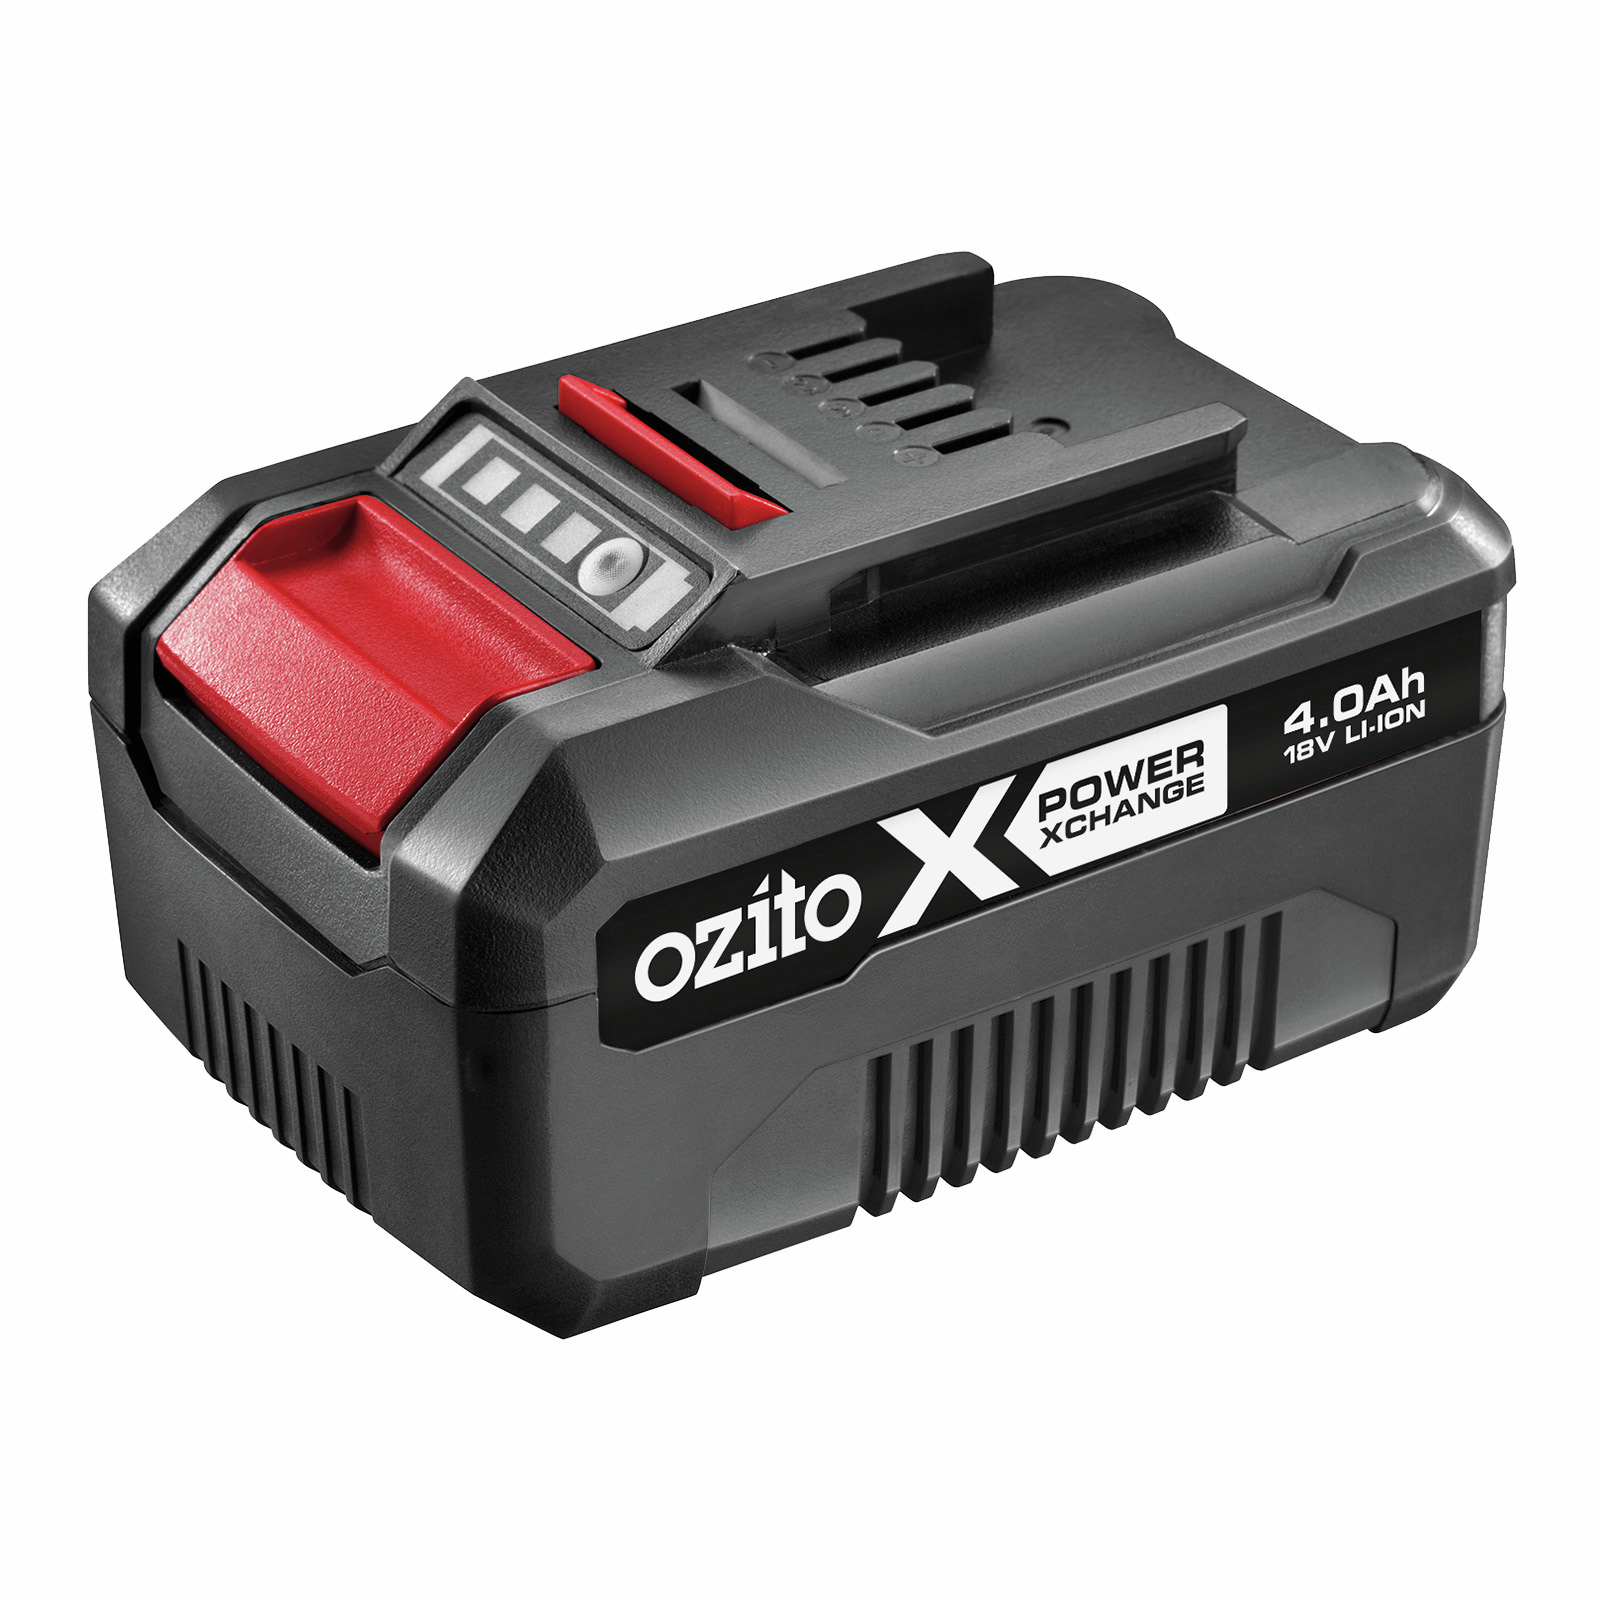 Ozito PXC 18V Black Series 4.0Ah Lithium Ion Battery